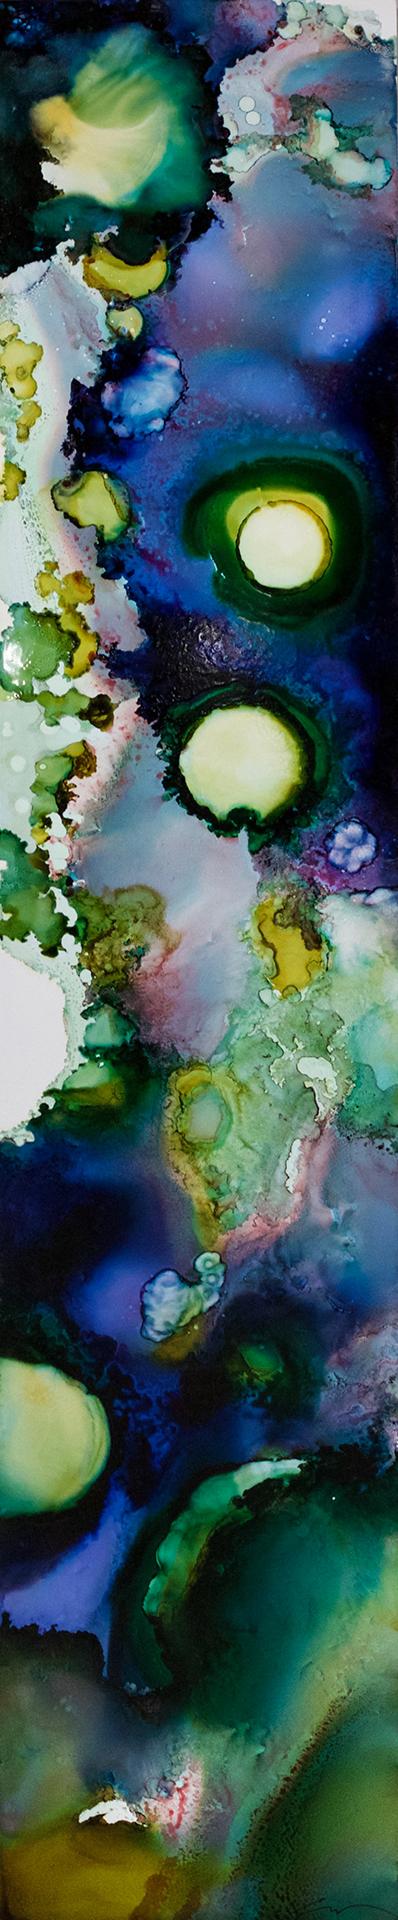 Habitat Series: Freshwater-Lichen 18x80 #110216ia